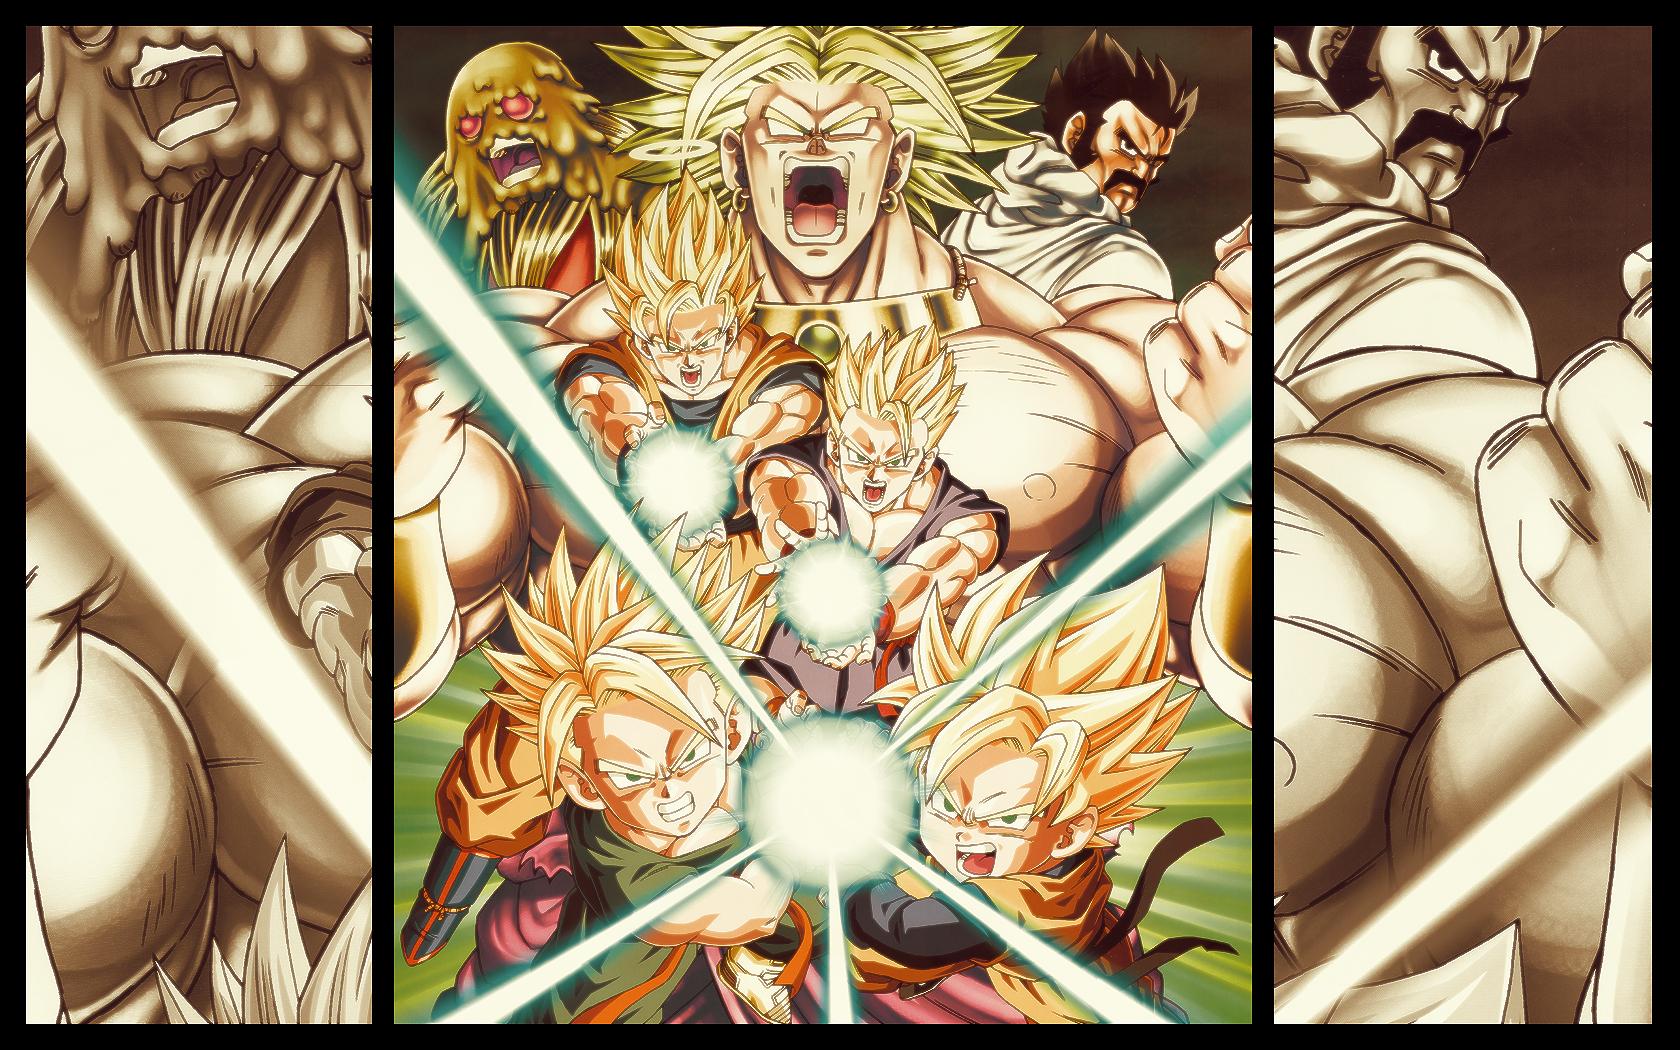 Dragon Ball Z Games 11 Desktop Wallpaper Animewpcom